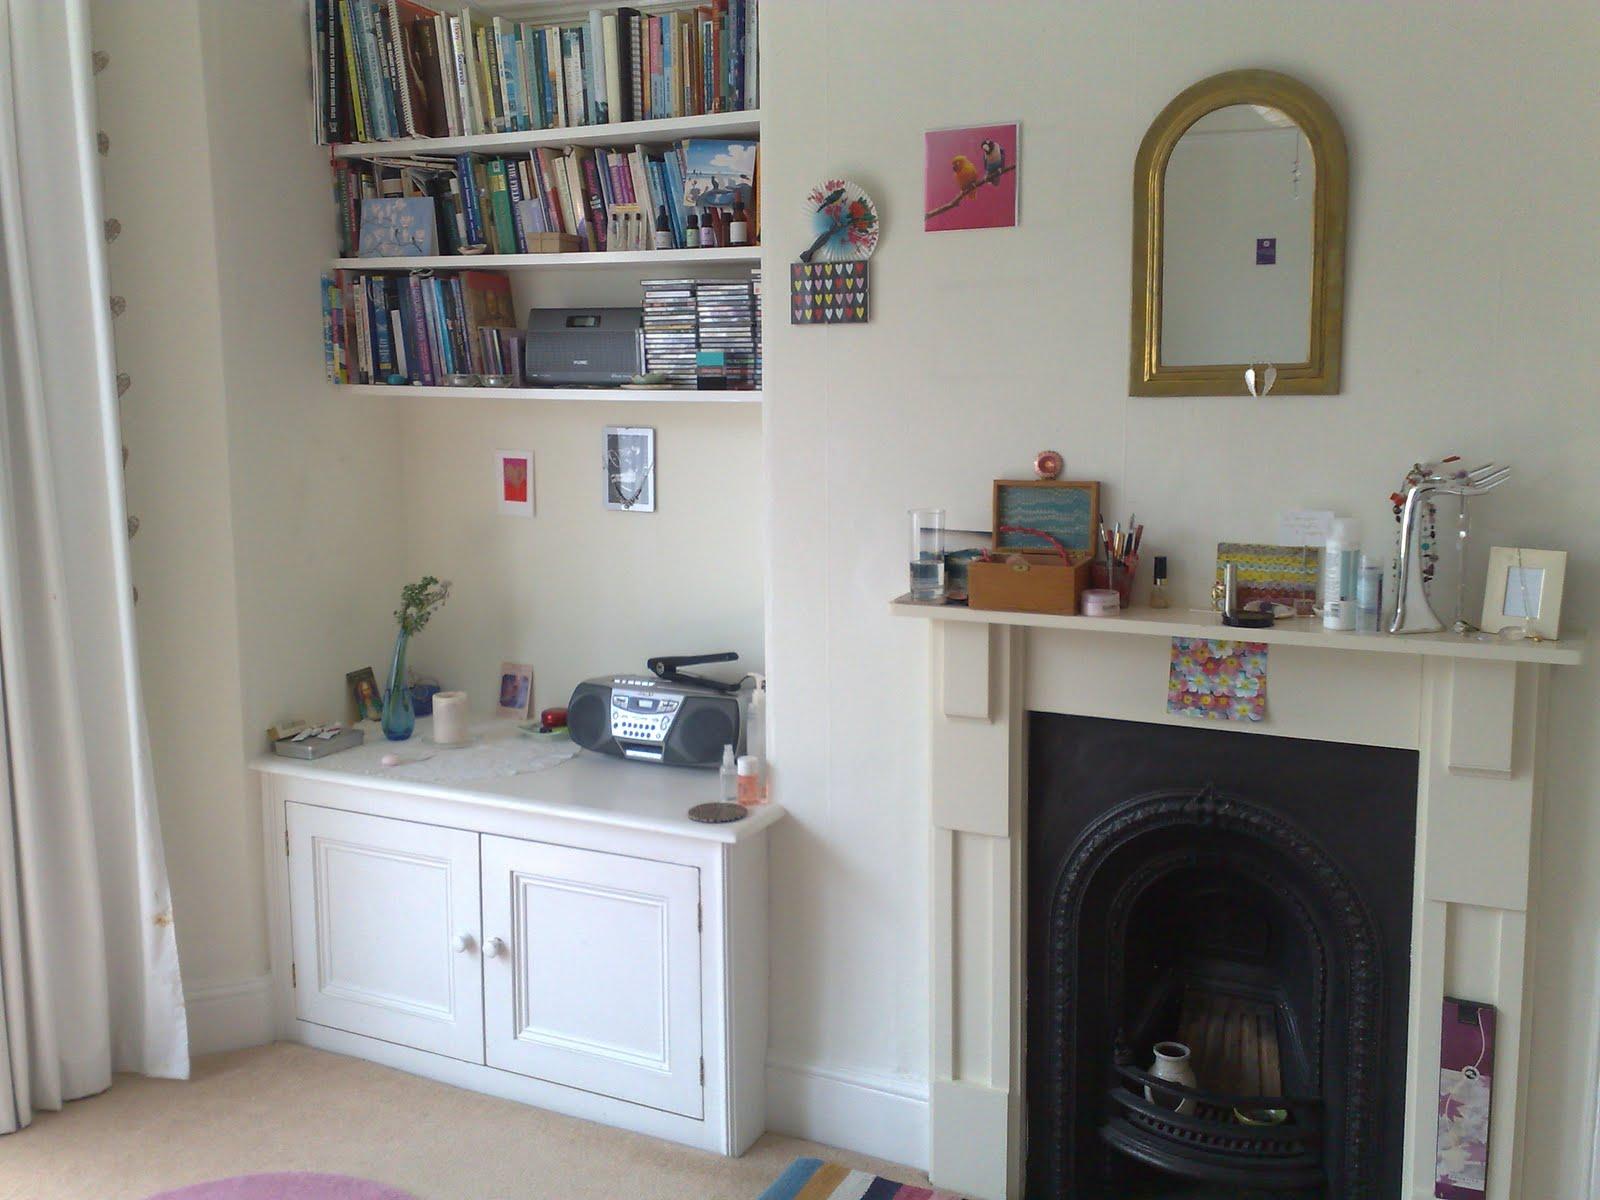 Becky Bell Cabinetmaker Bespoke kitchens London: Alcove